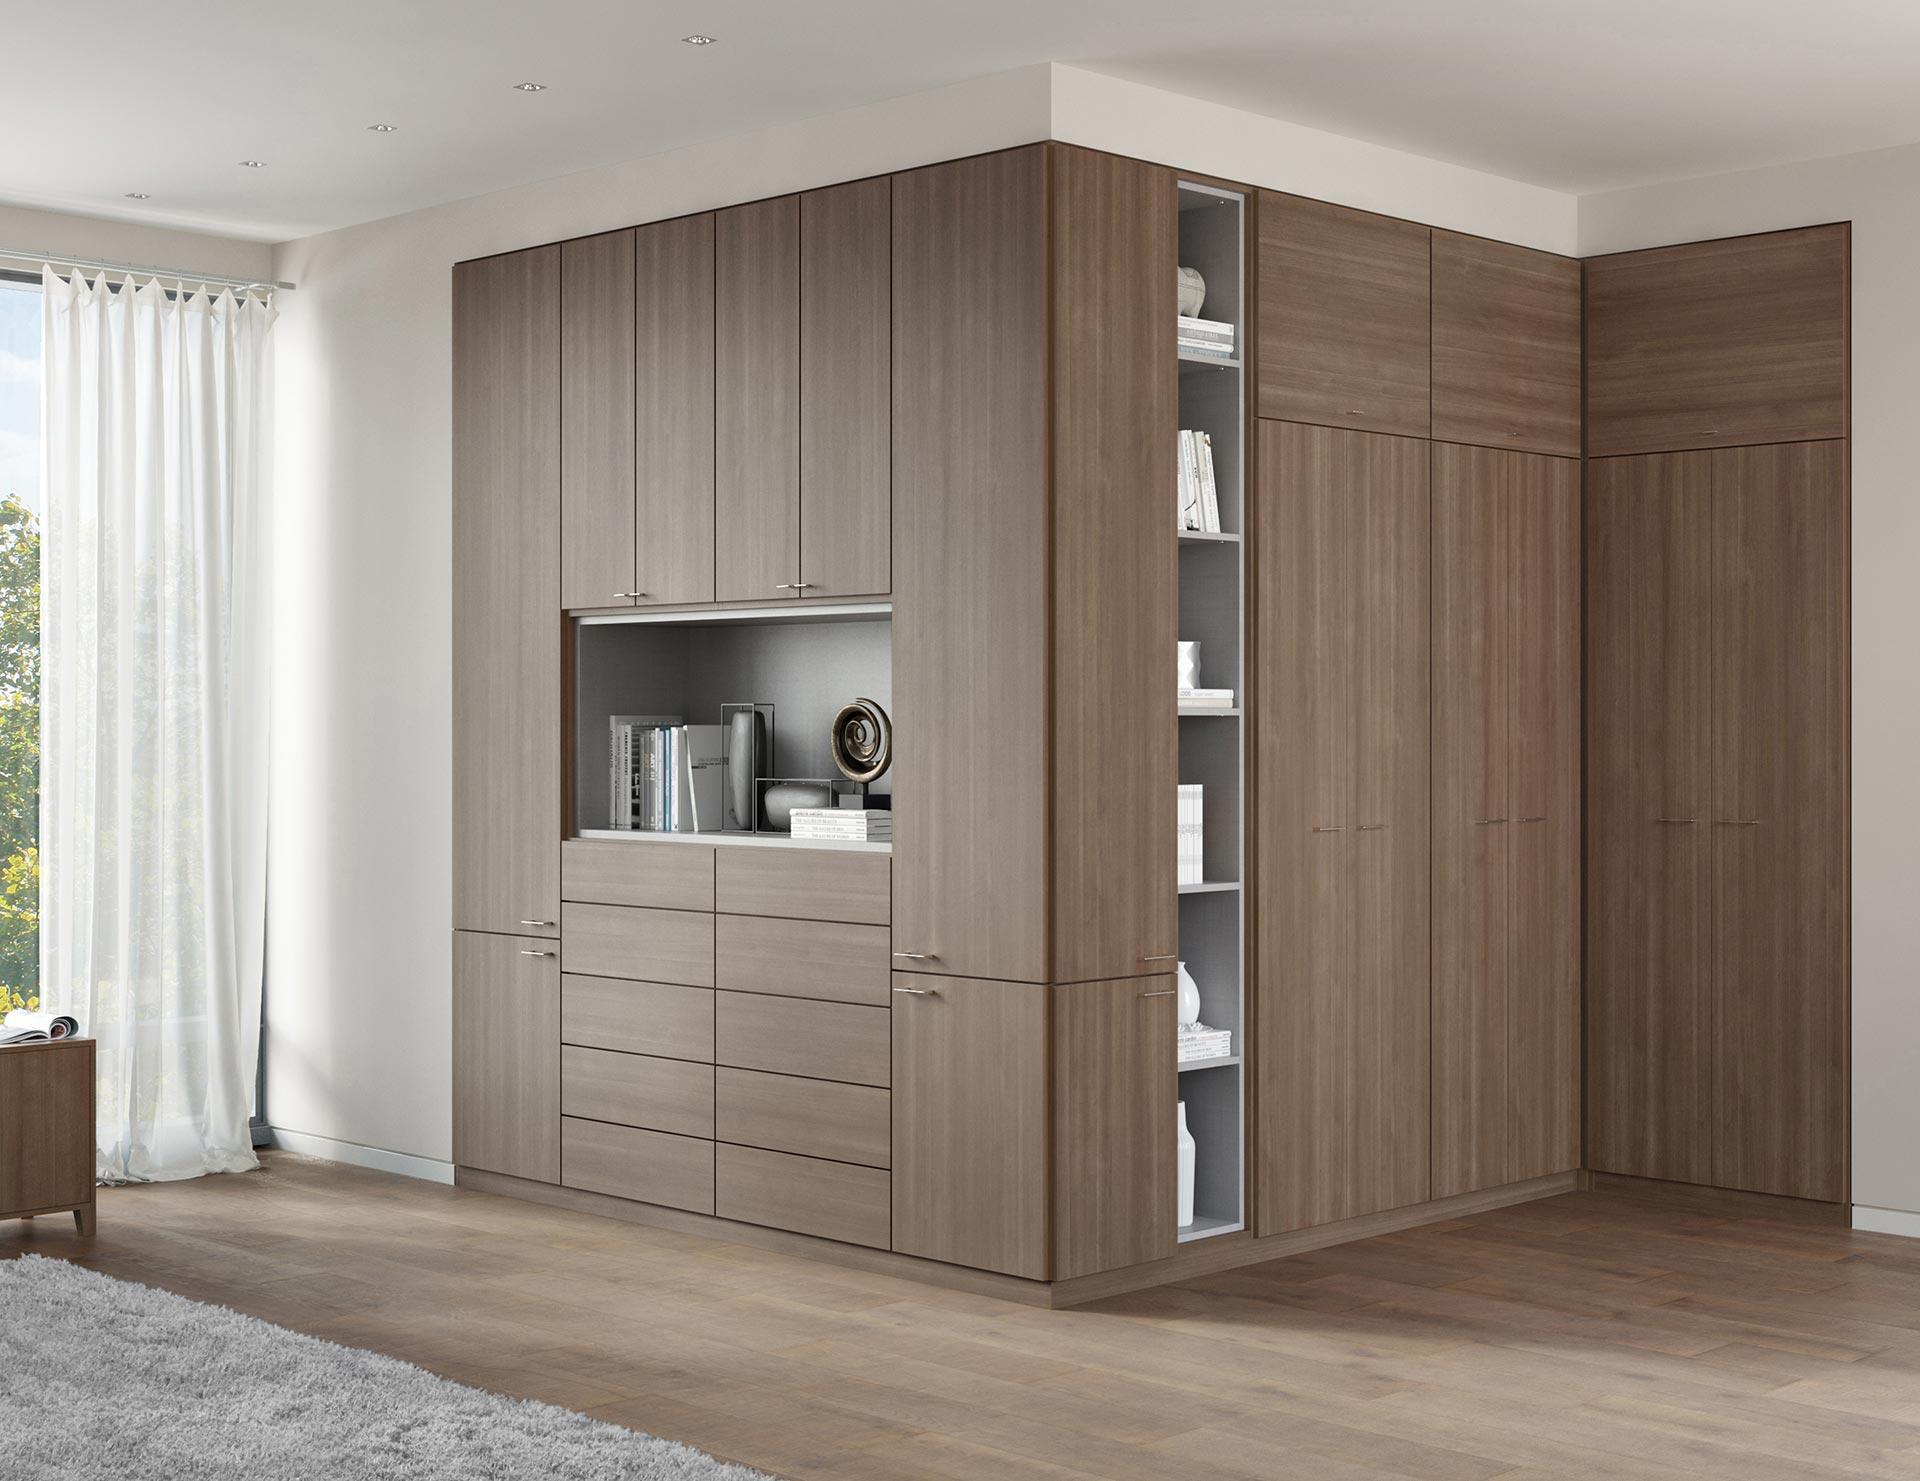 soho built-in wardrobe closet TUANQTH